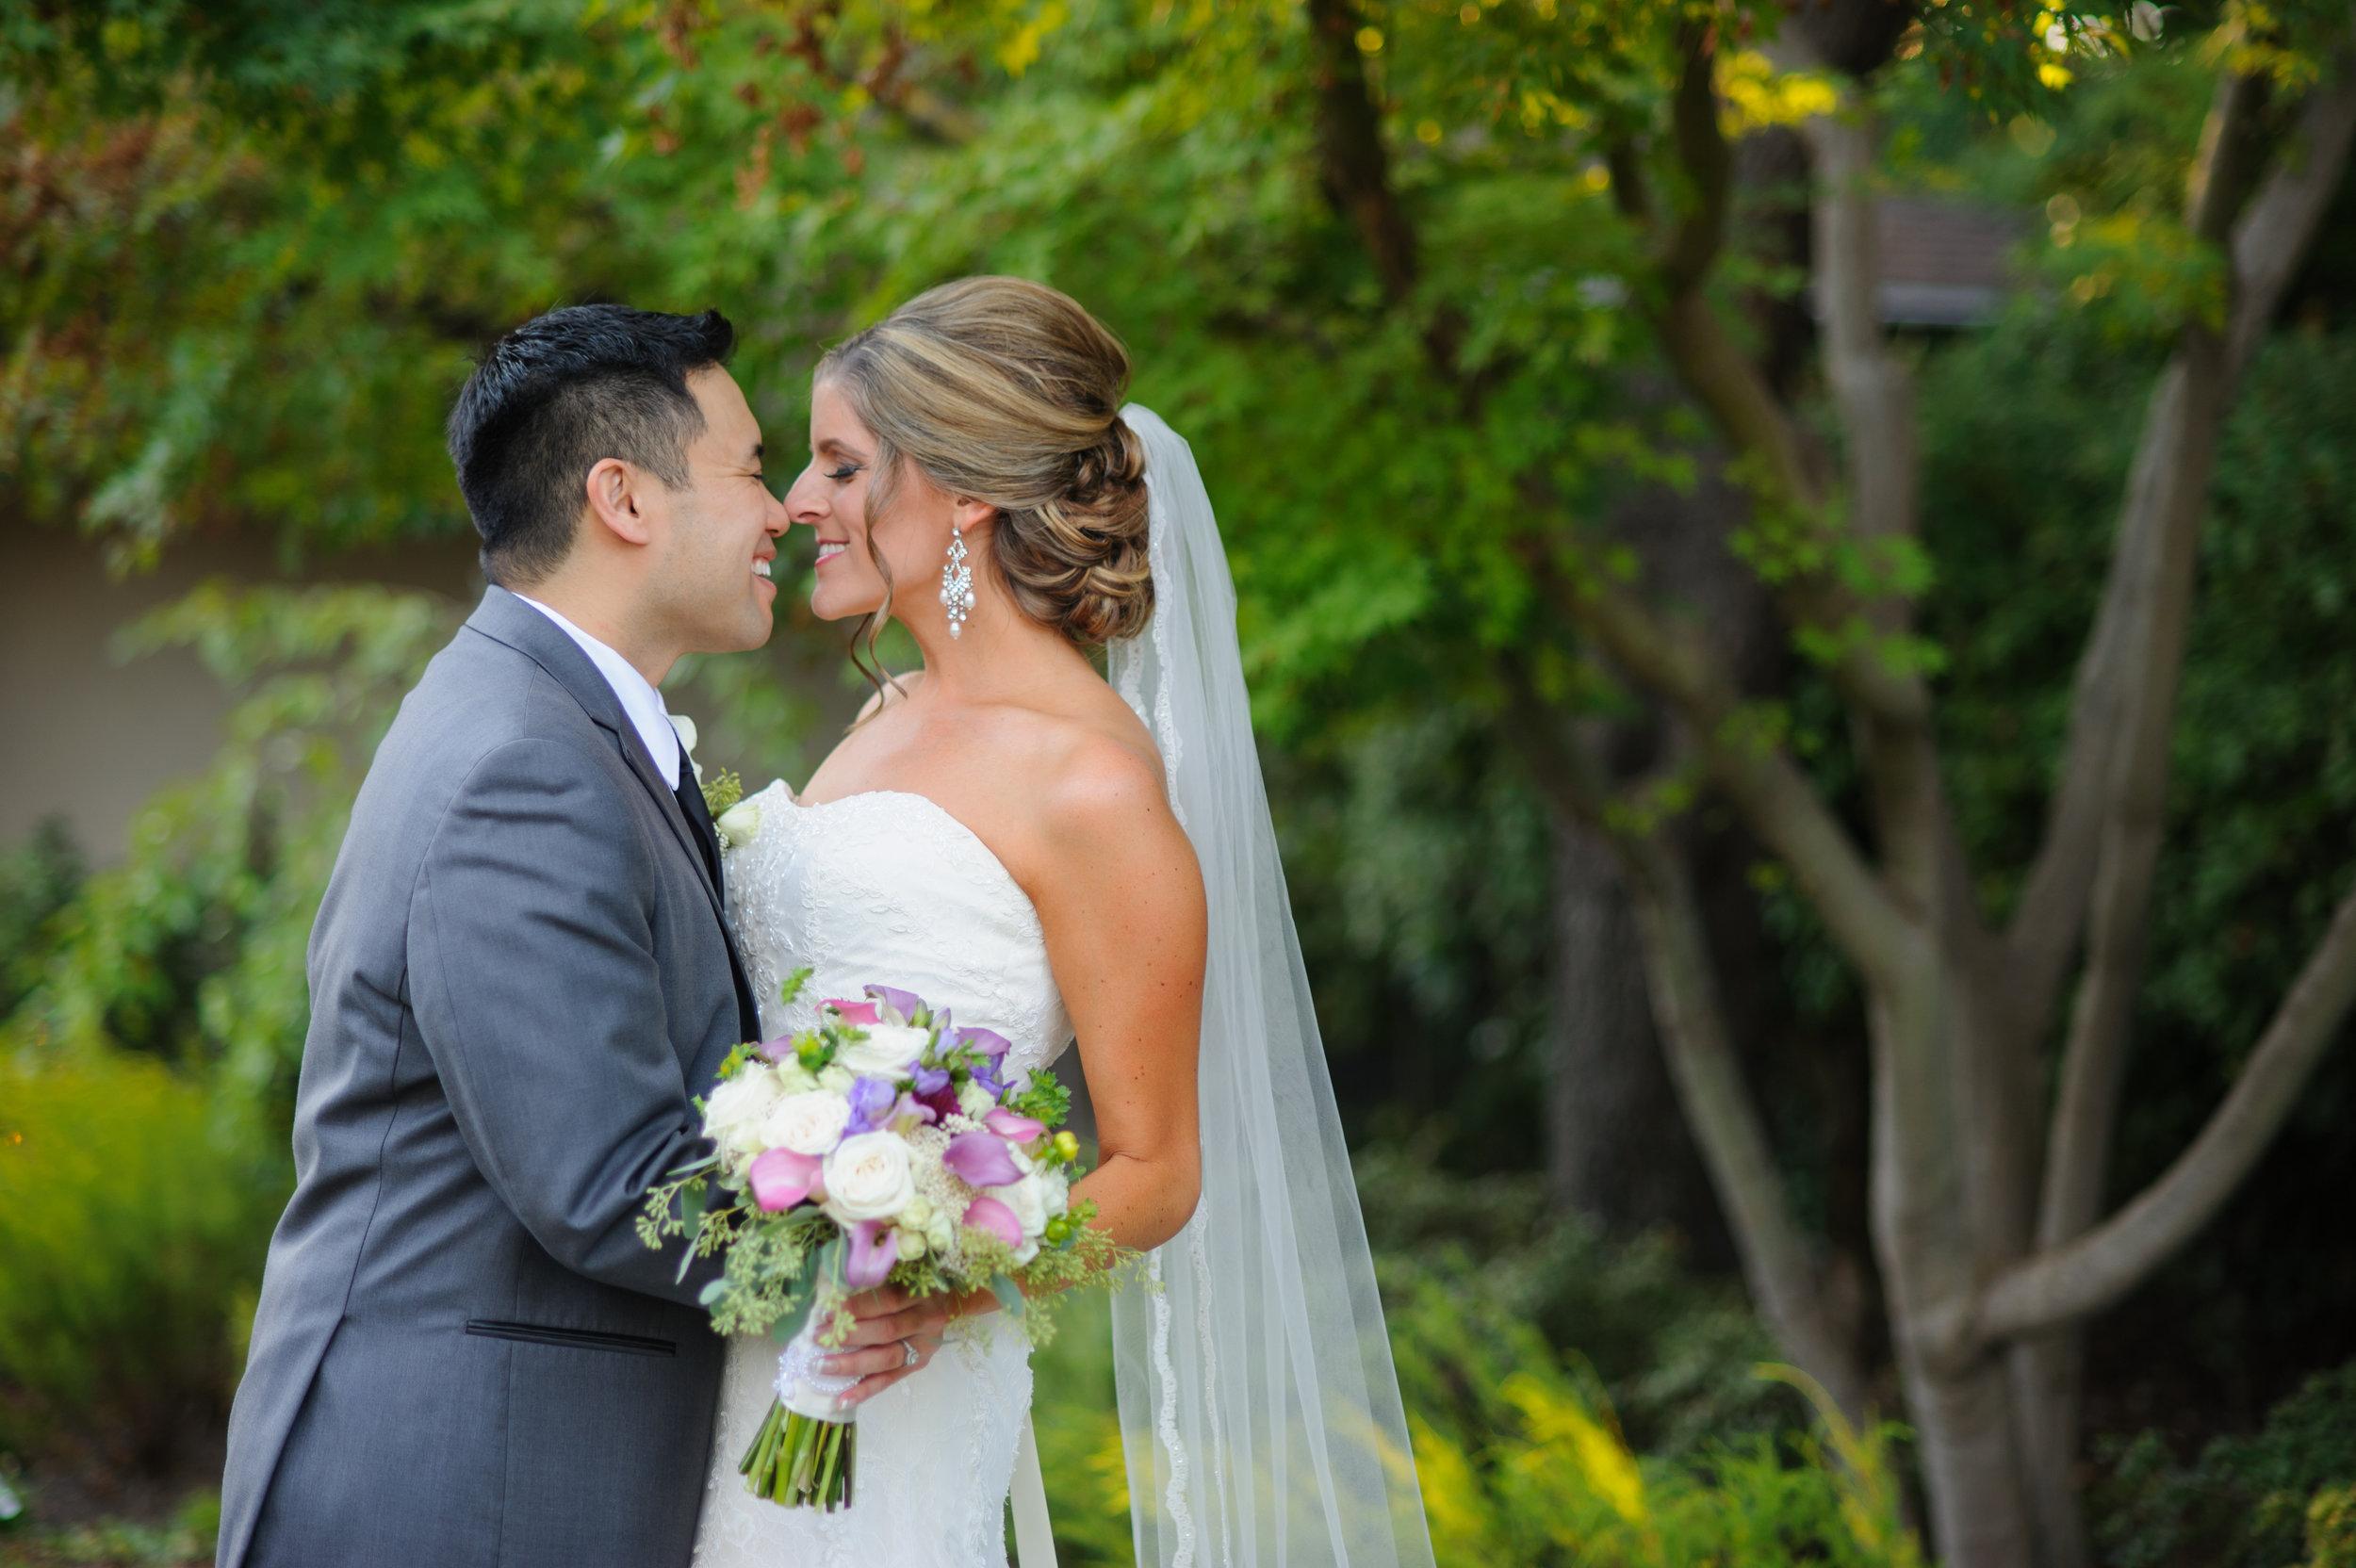 susan-brad-024-sacramento-wedding-photographer-katherine-nicole-photography.JPG